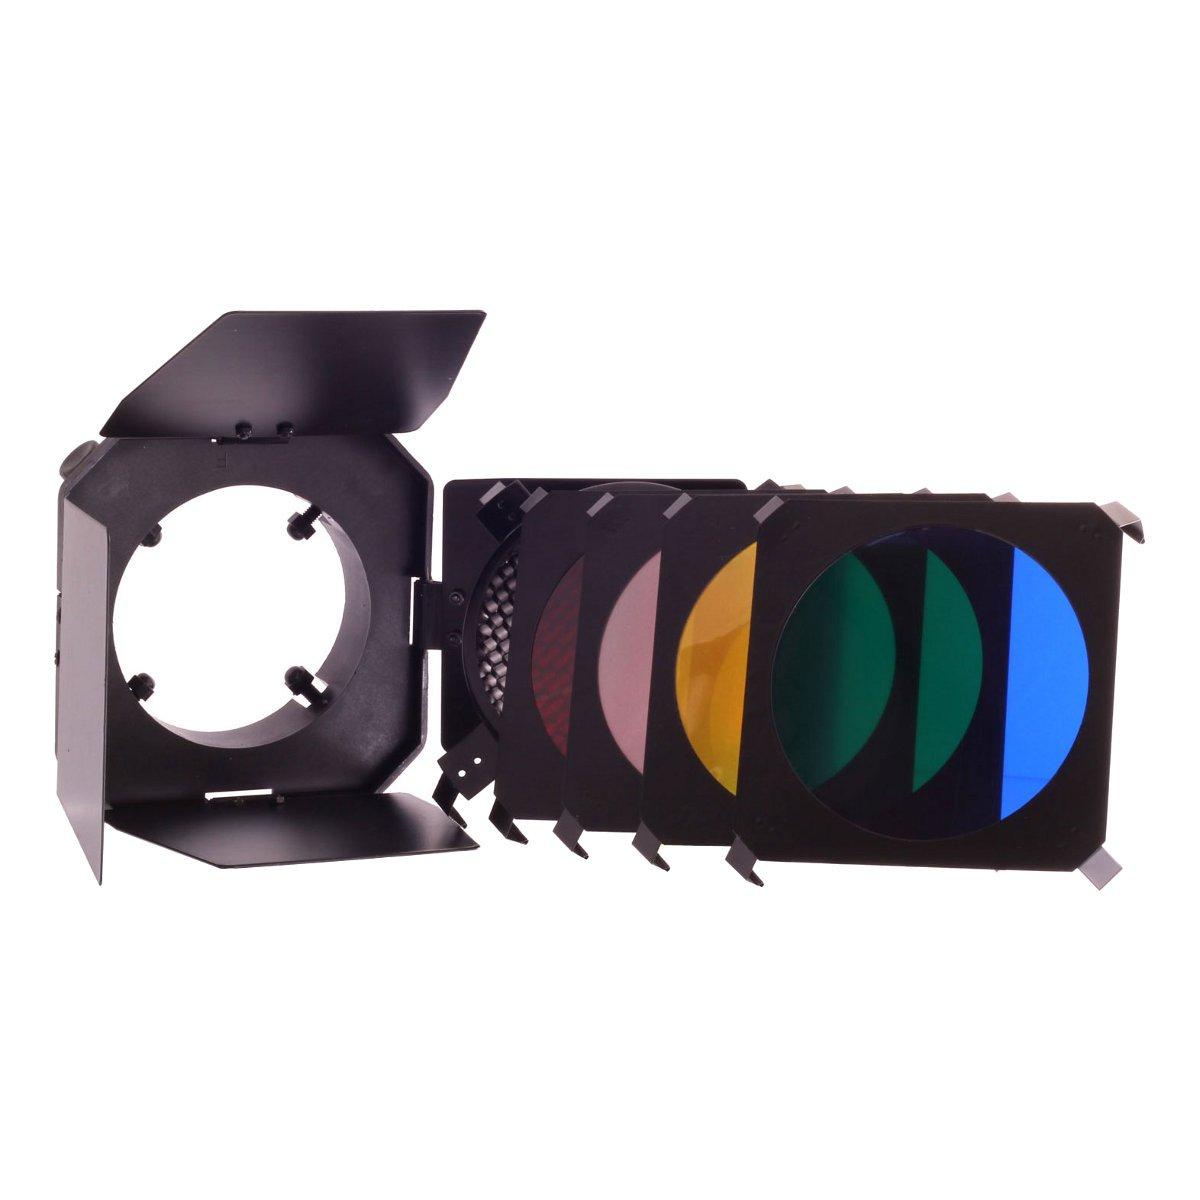 Dorr SLBL Barn Door Kit Honeycomb and 4 Colour Filter Set [371826]